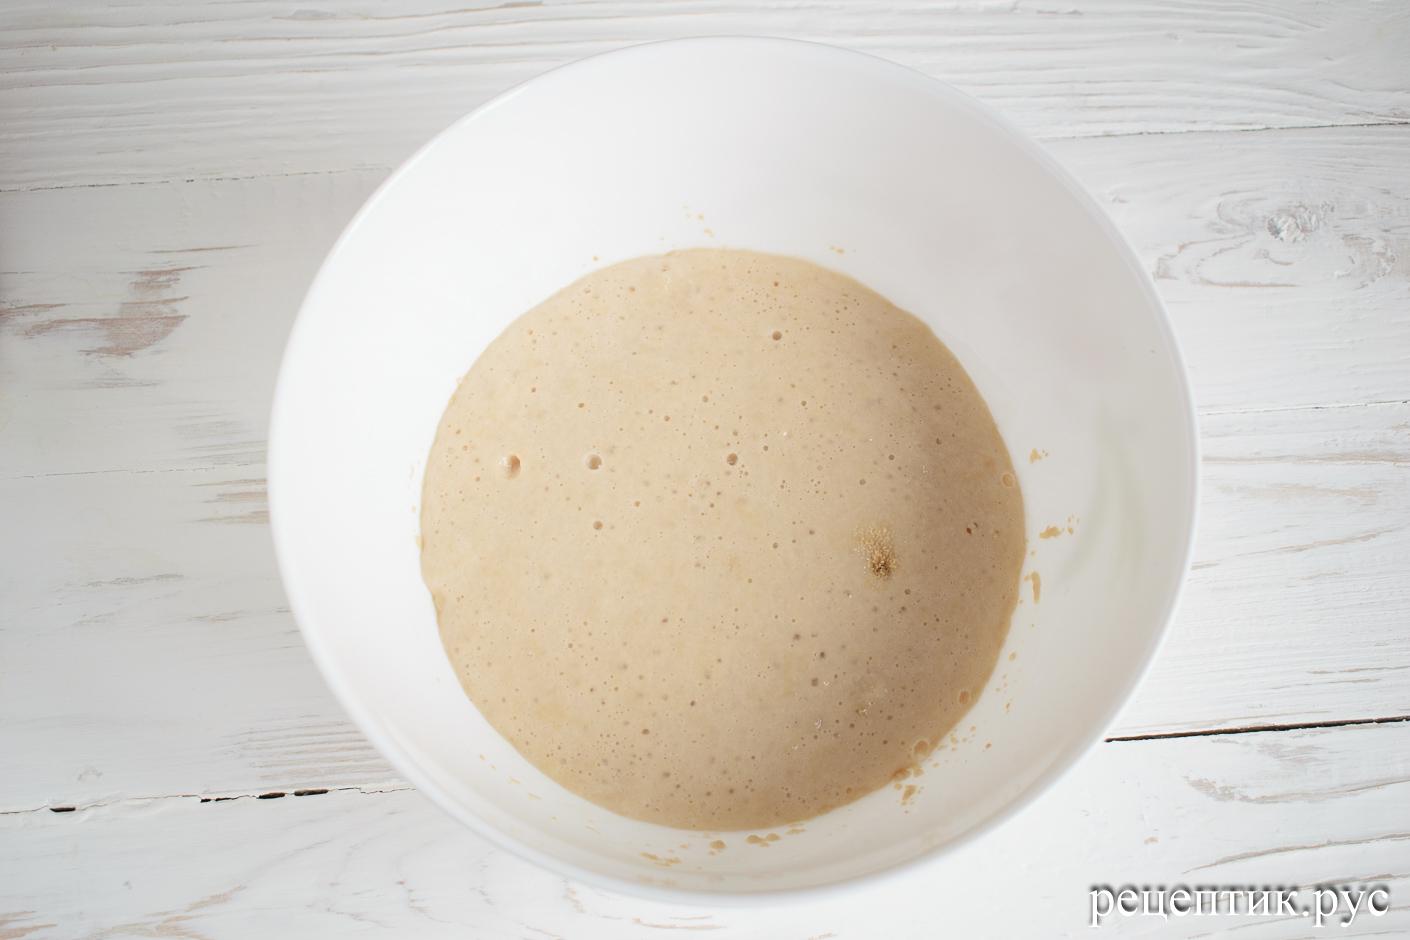 Дрожжевая булка с сыром - рецепт с фото, шаг 1